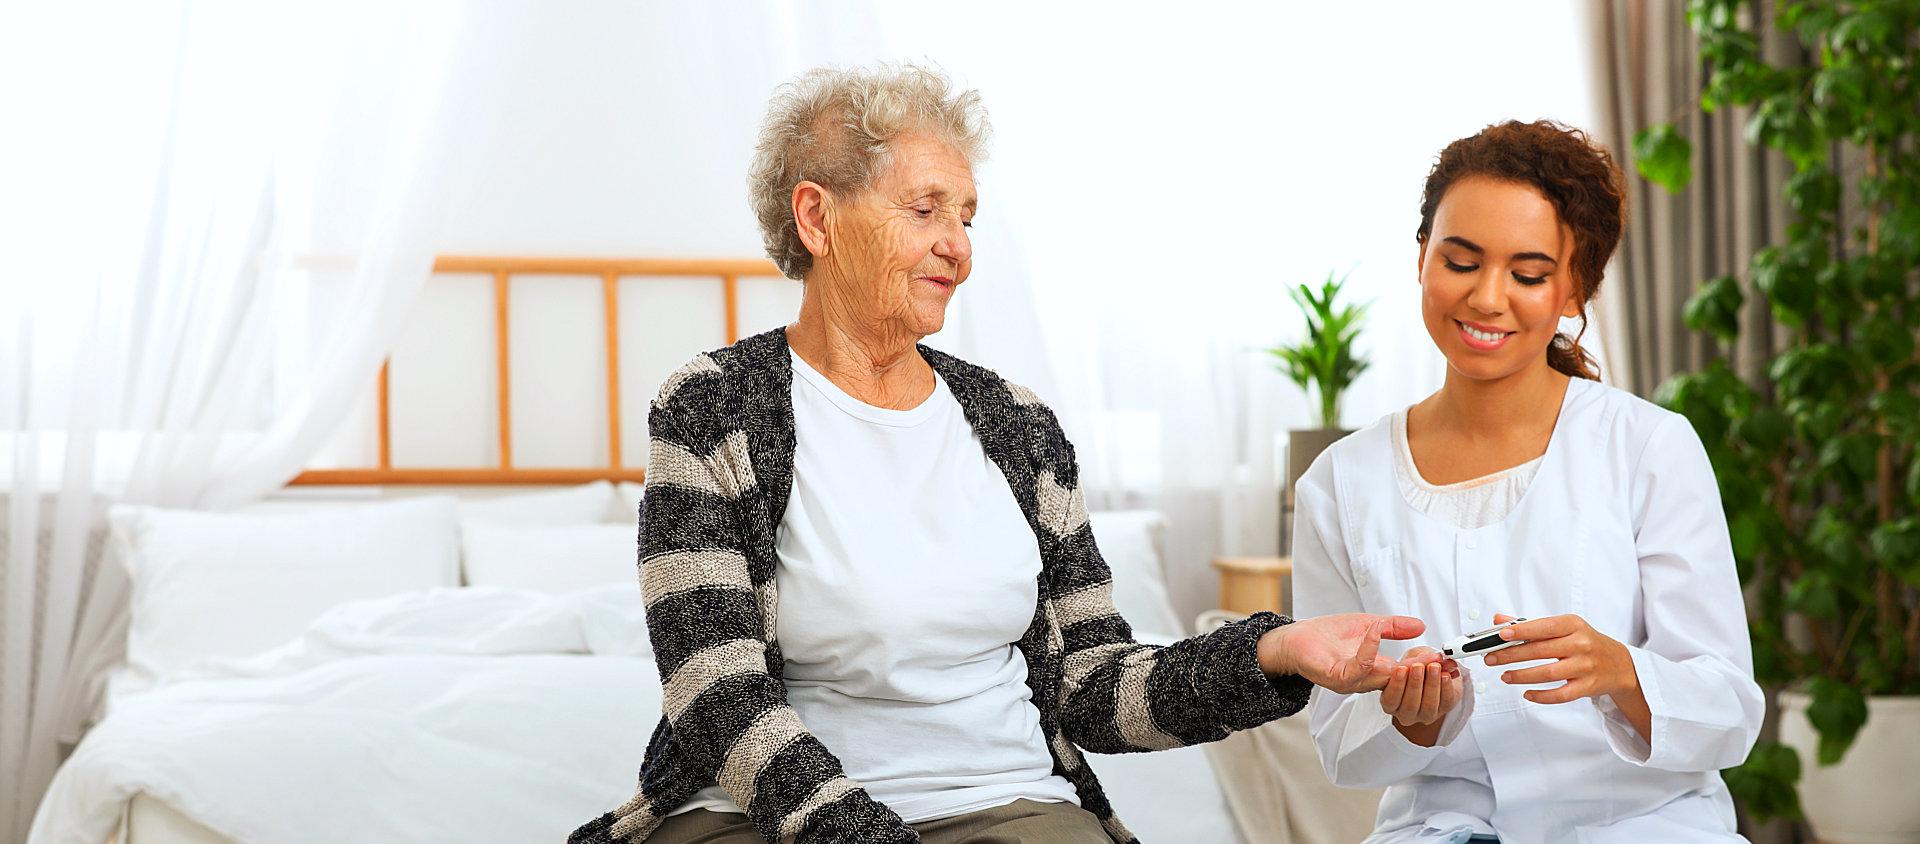 caregiver monitoring the sugar level of senior woman